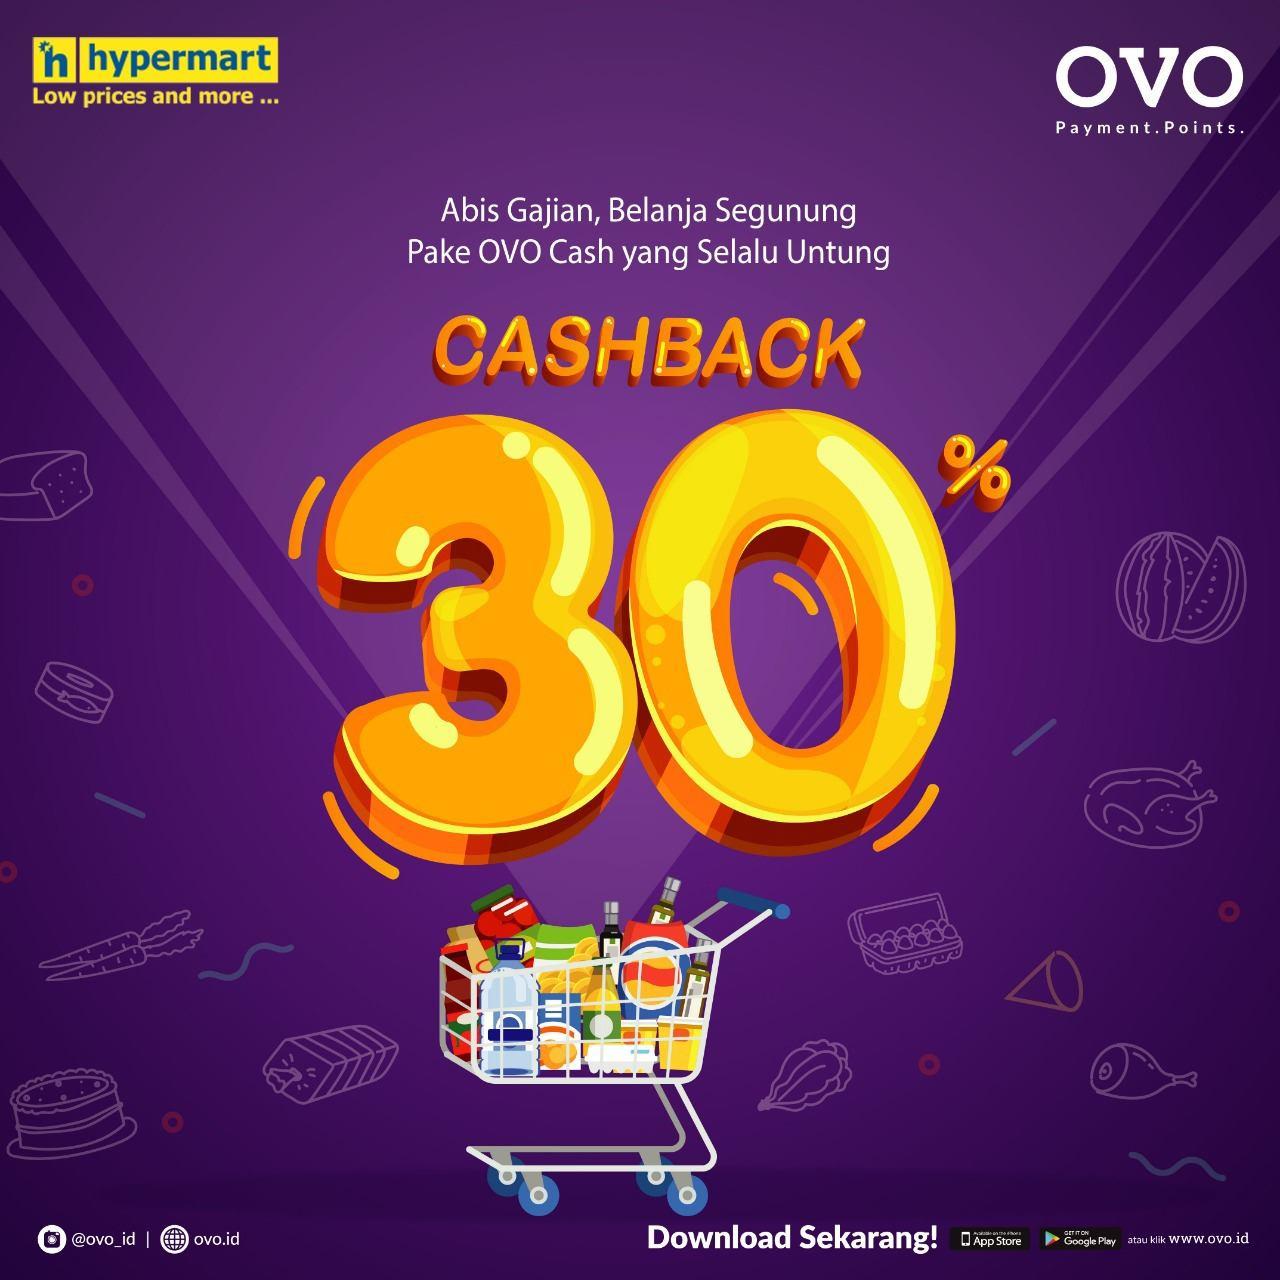 Diskon HYPERMART Promo CASHBACK 30% dengan OVO